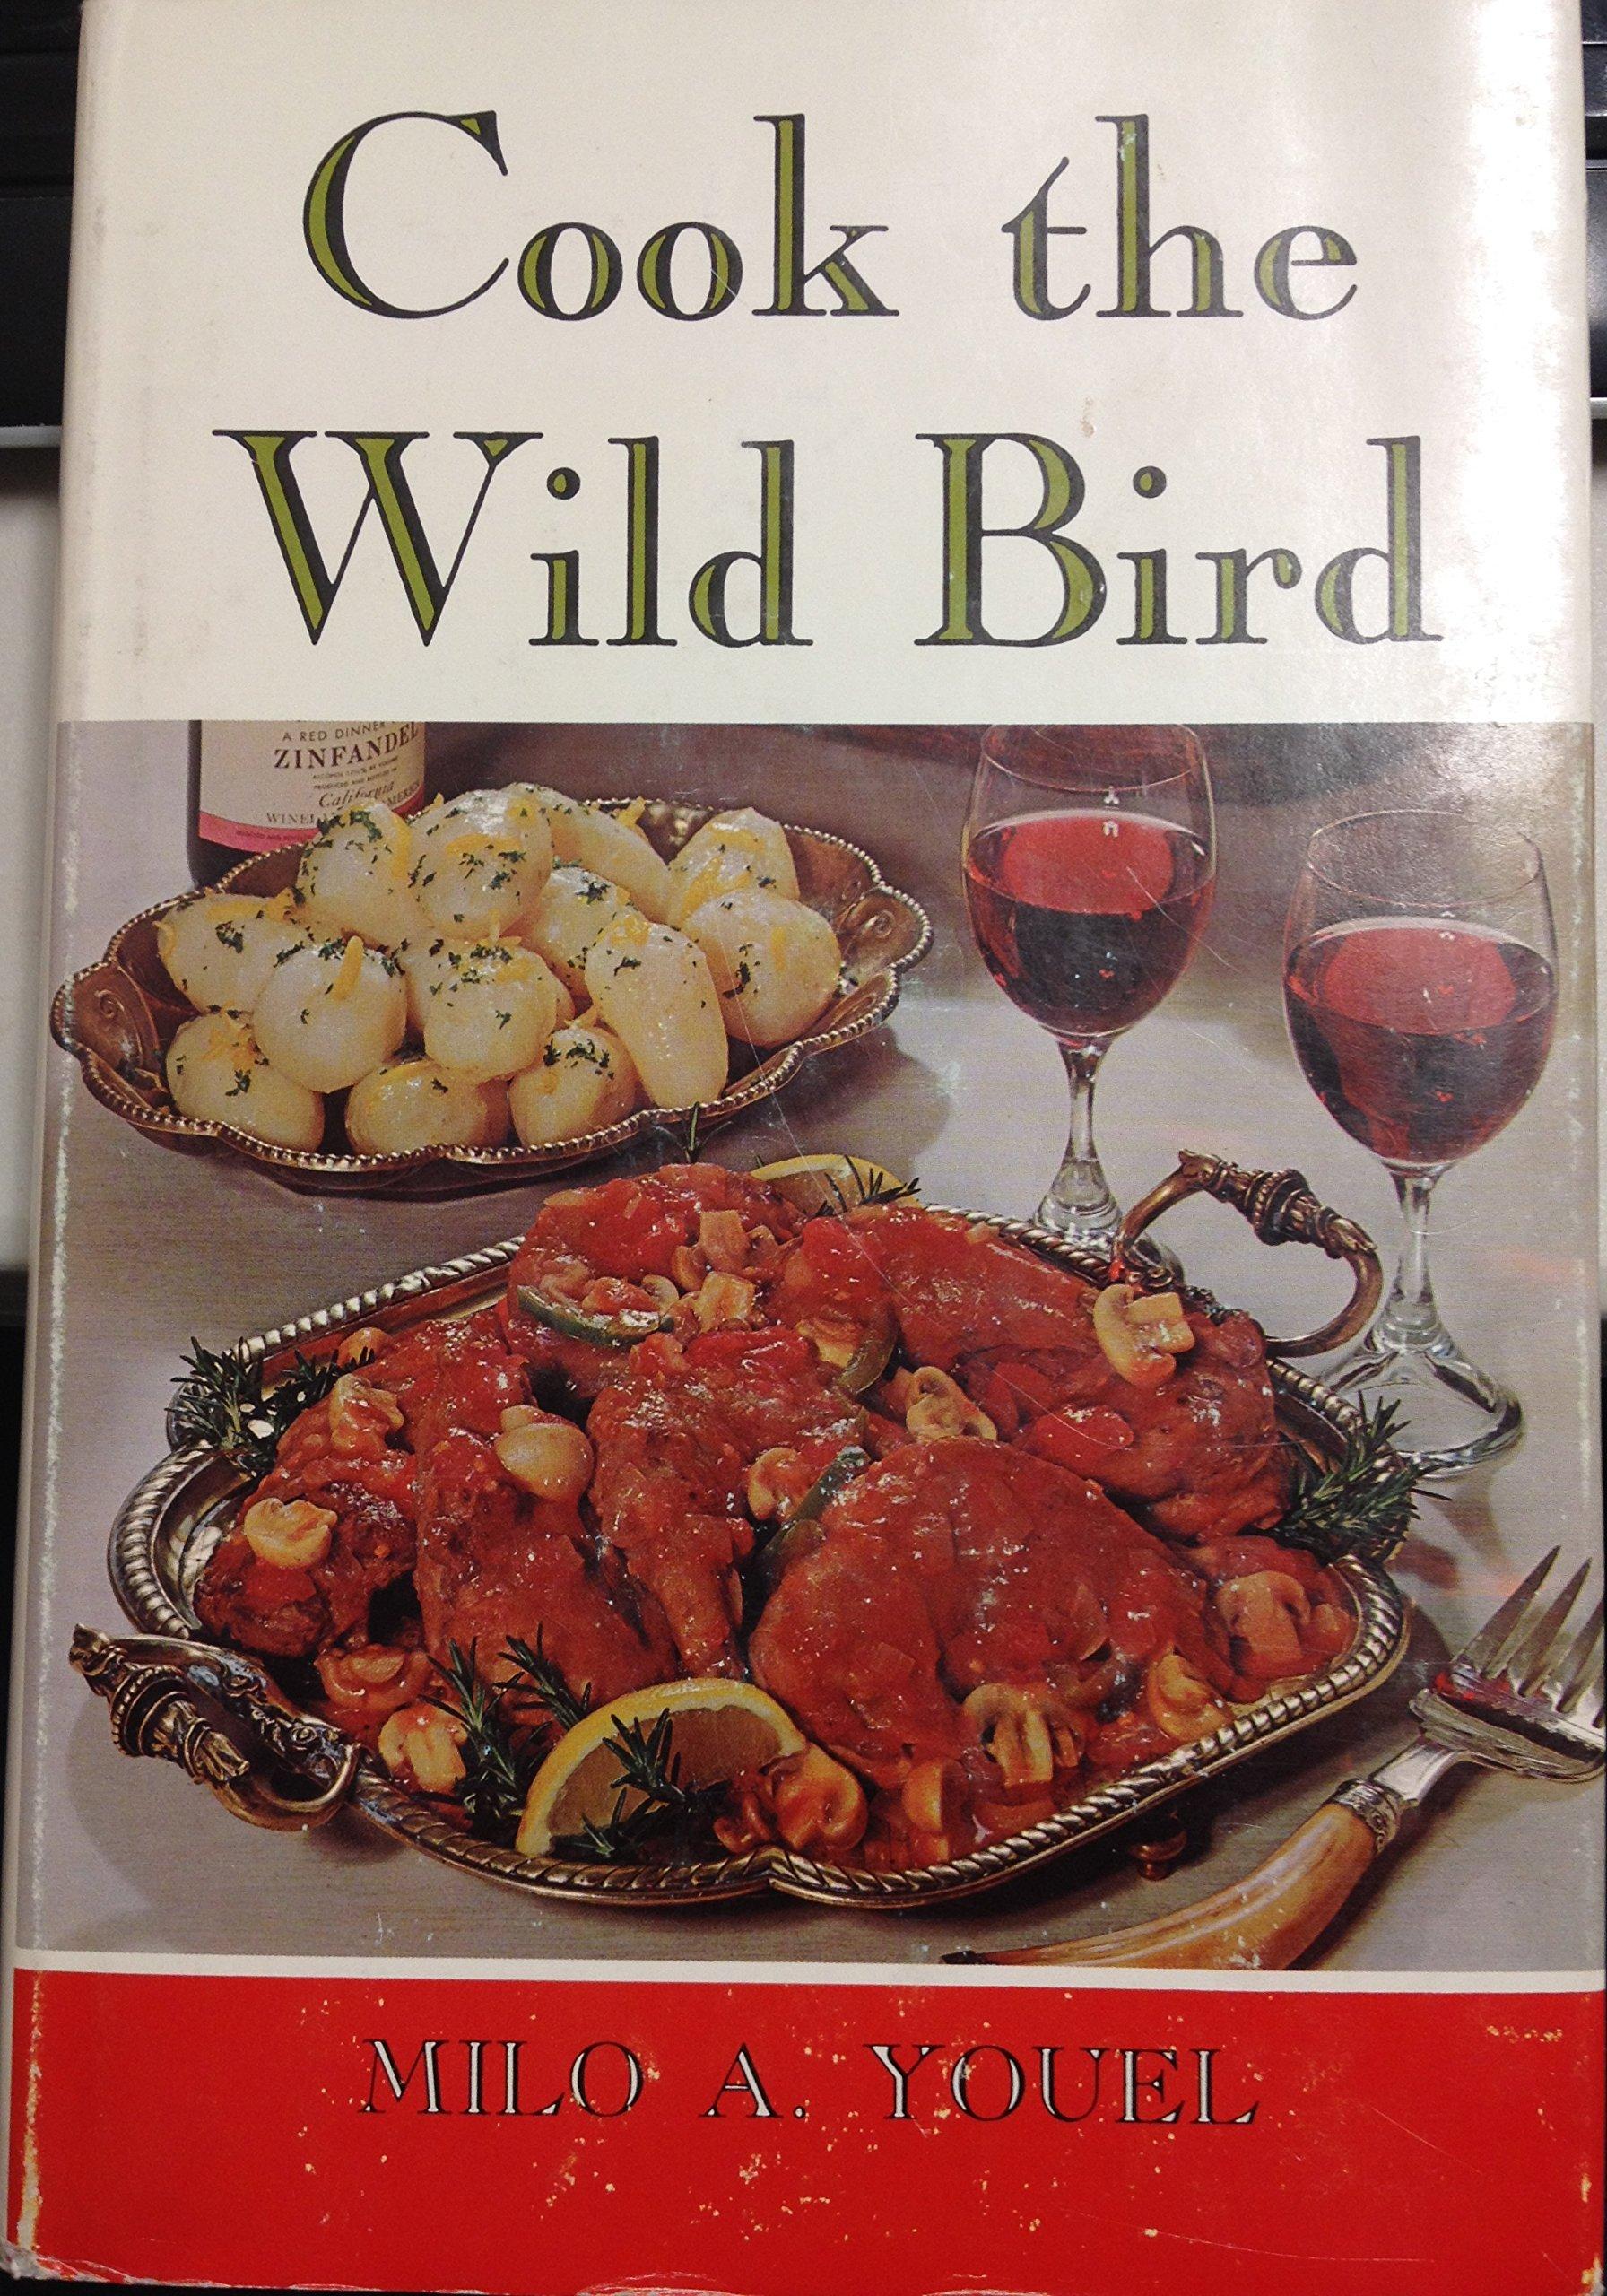 Cook the wild bird milo a youel 9780498011931 amazon books forumfinder Gallery